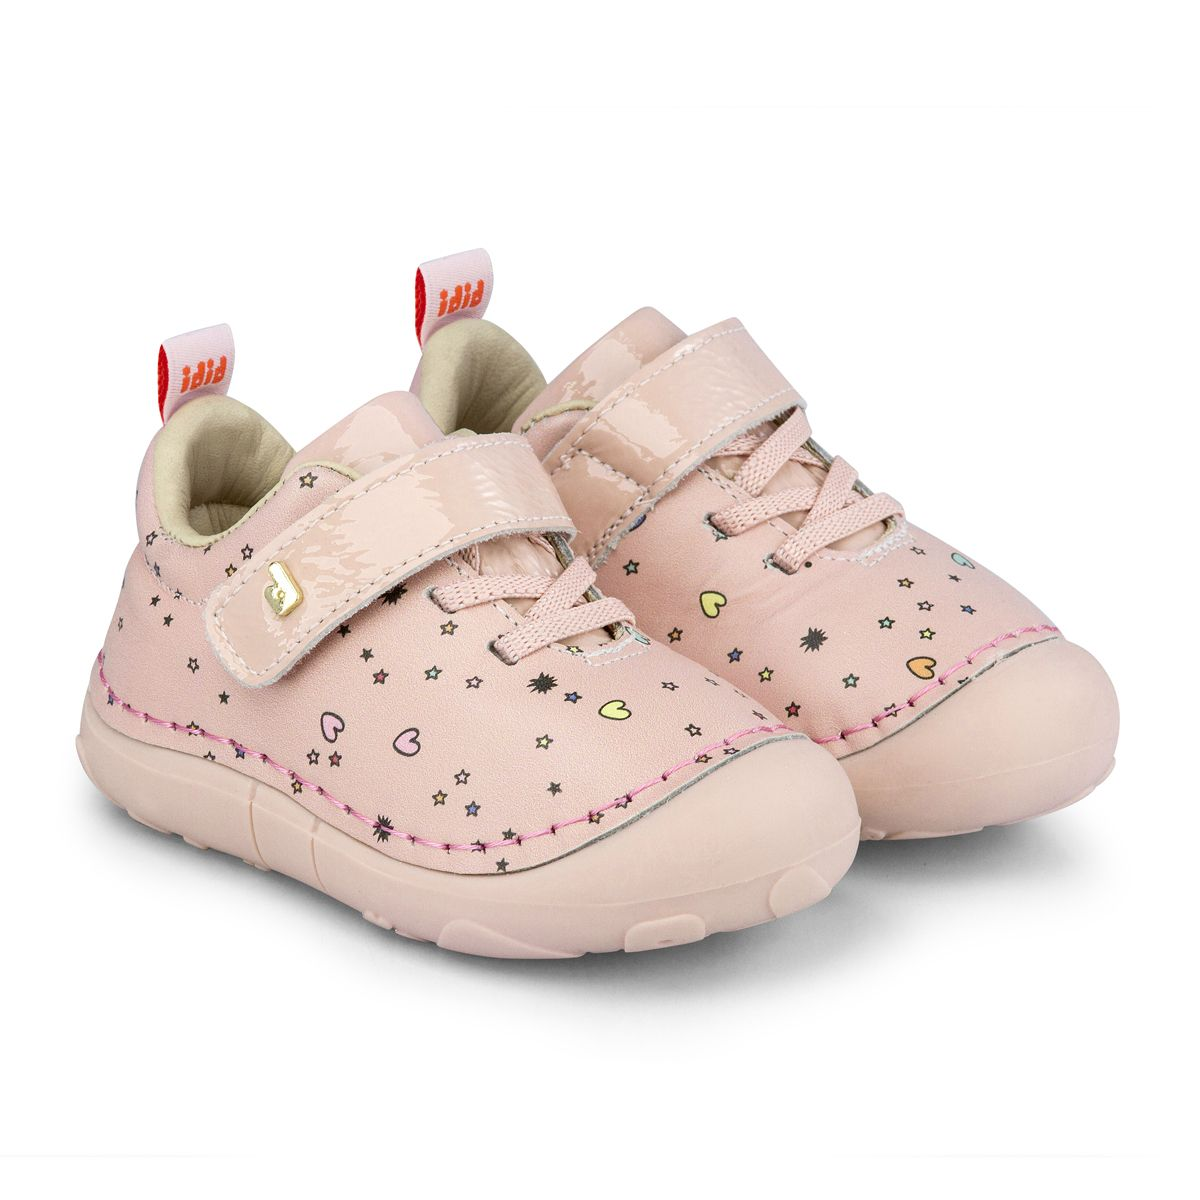 Pantofi sport Bibi Shoes Grow Happy Place, Camelia